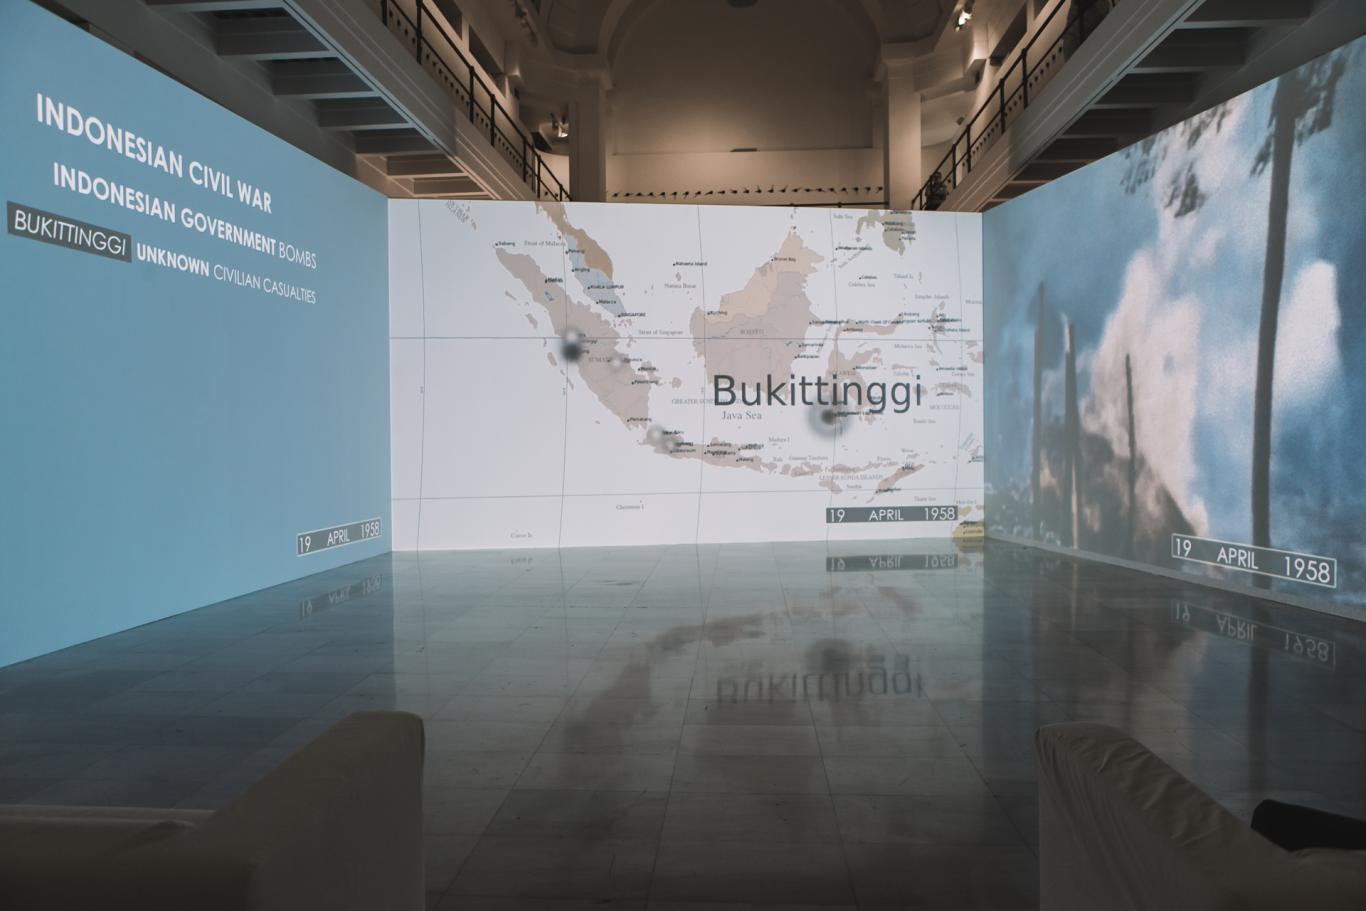 Instalación audiovisual de Cristina Lucas a modo de tríptico con mapas geográficos en los que se marcan países que han sufrido ataques aéreos